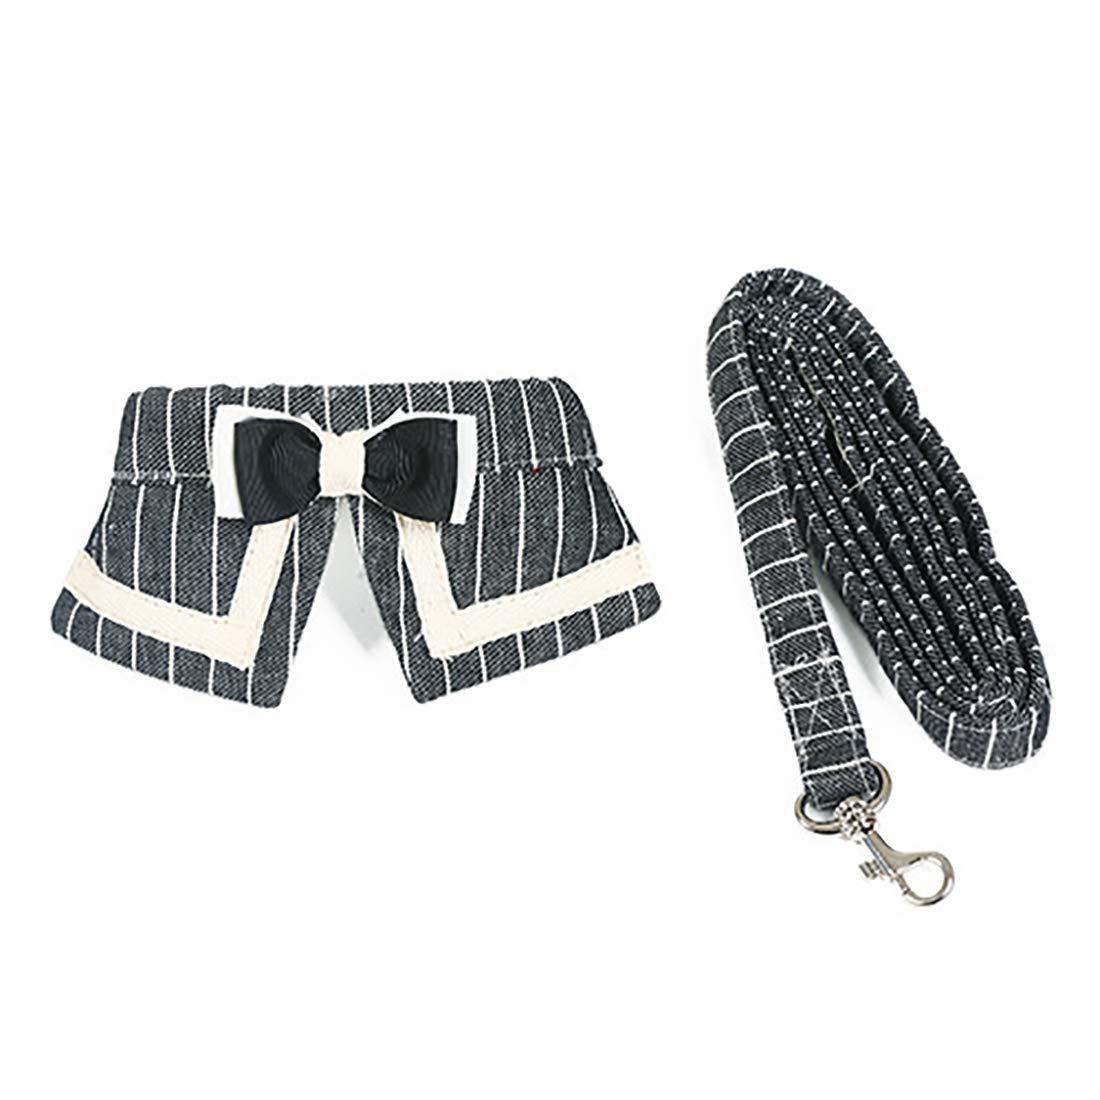 Black L Black L MISSKERVINFENDRIYUN Dogs Chest Strap Puppy Chain Stripe Tie Collar Tie Pull Belt Cat Chest Harness Traction (color   Black, Size   L)